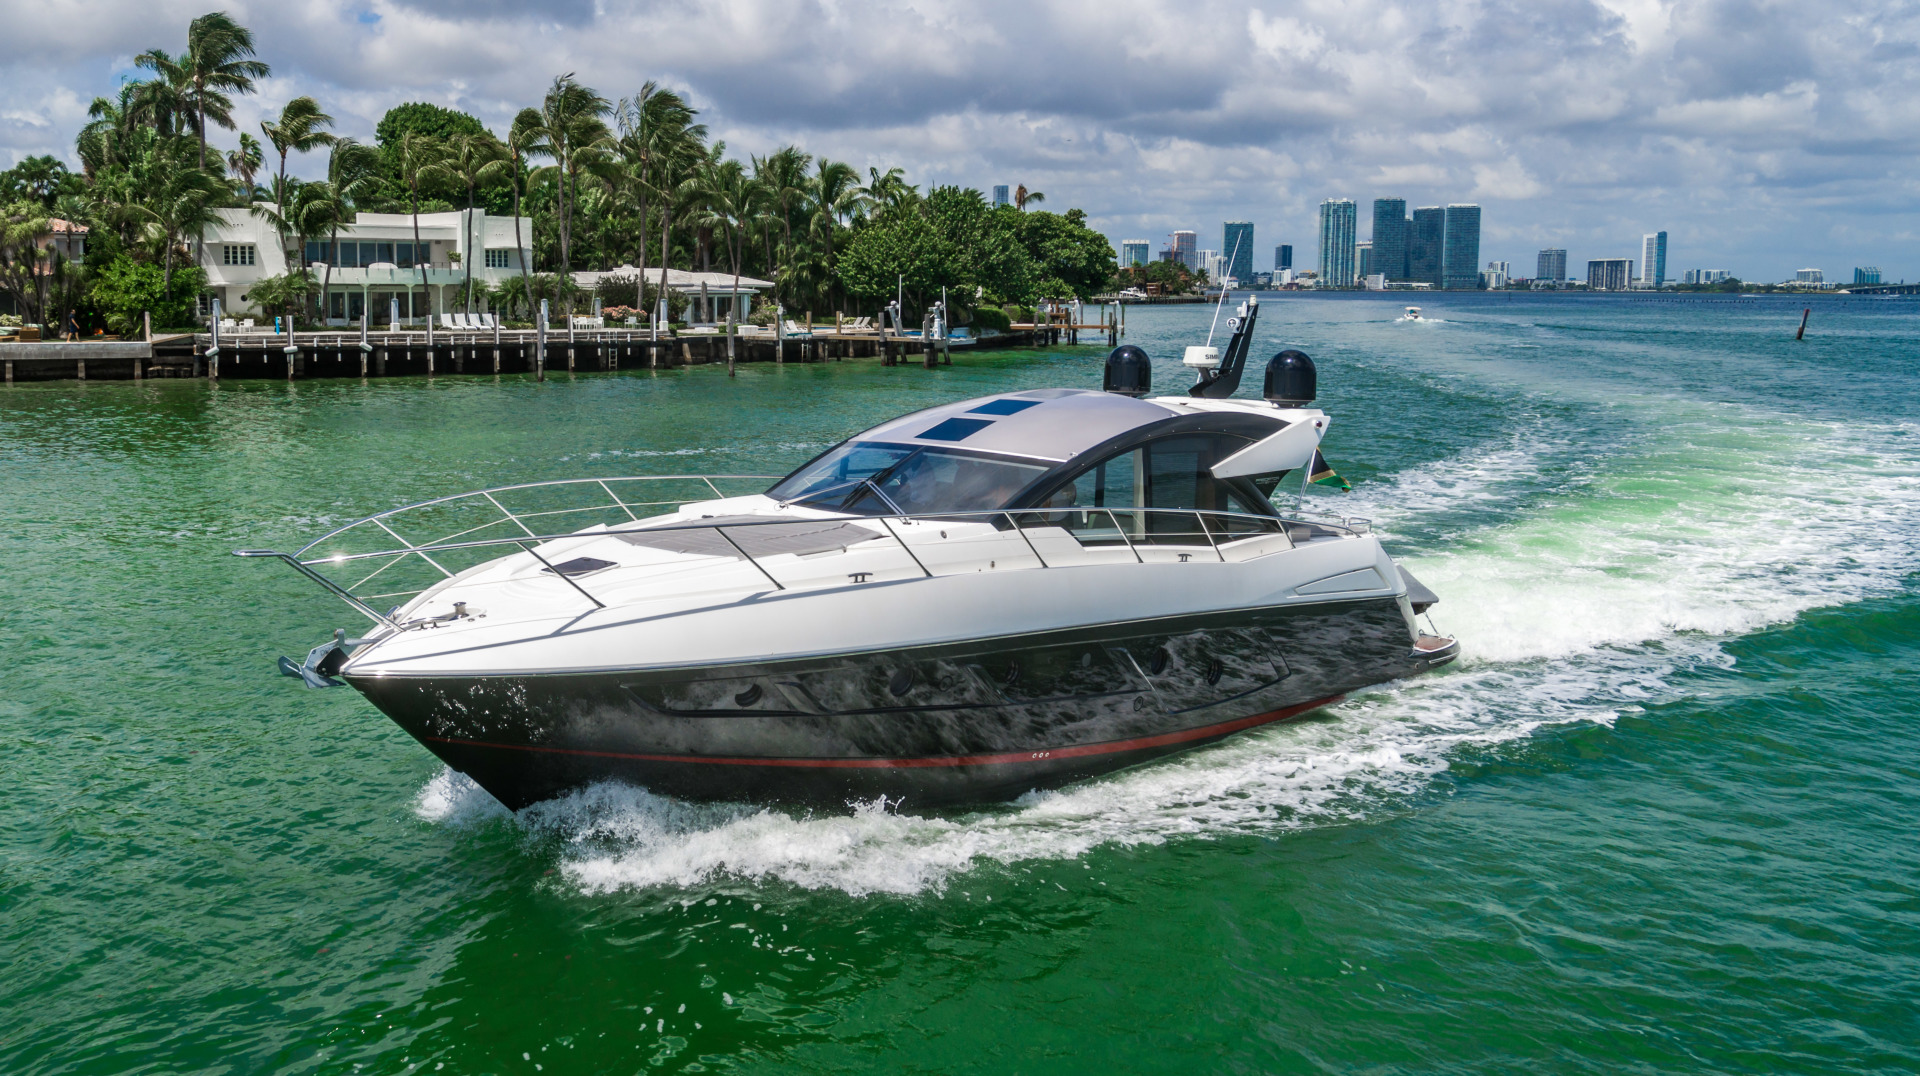 Sunseeker-Predator 2019 -Miami Beach-Florida-United States-1475705 | Thumbnail